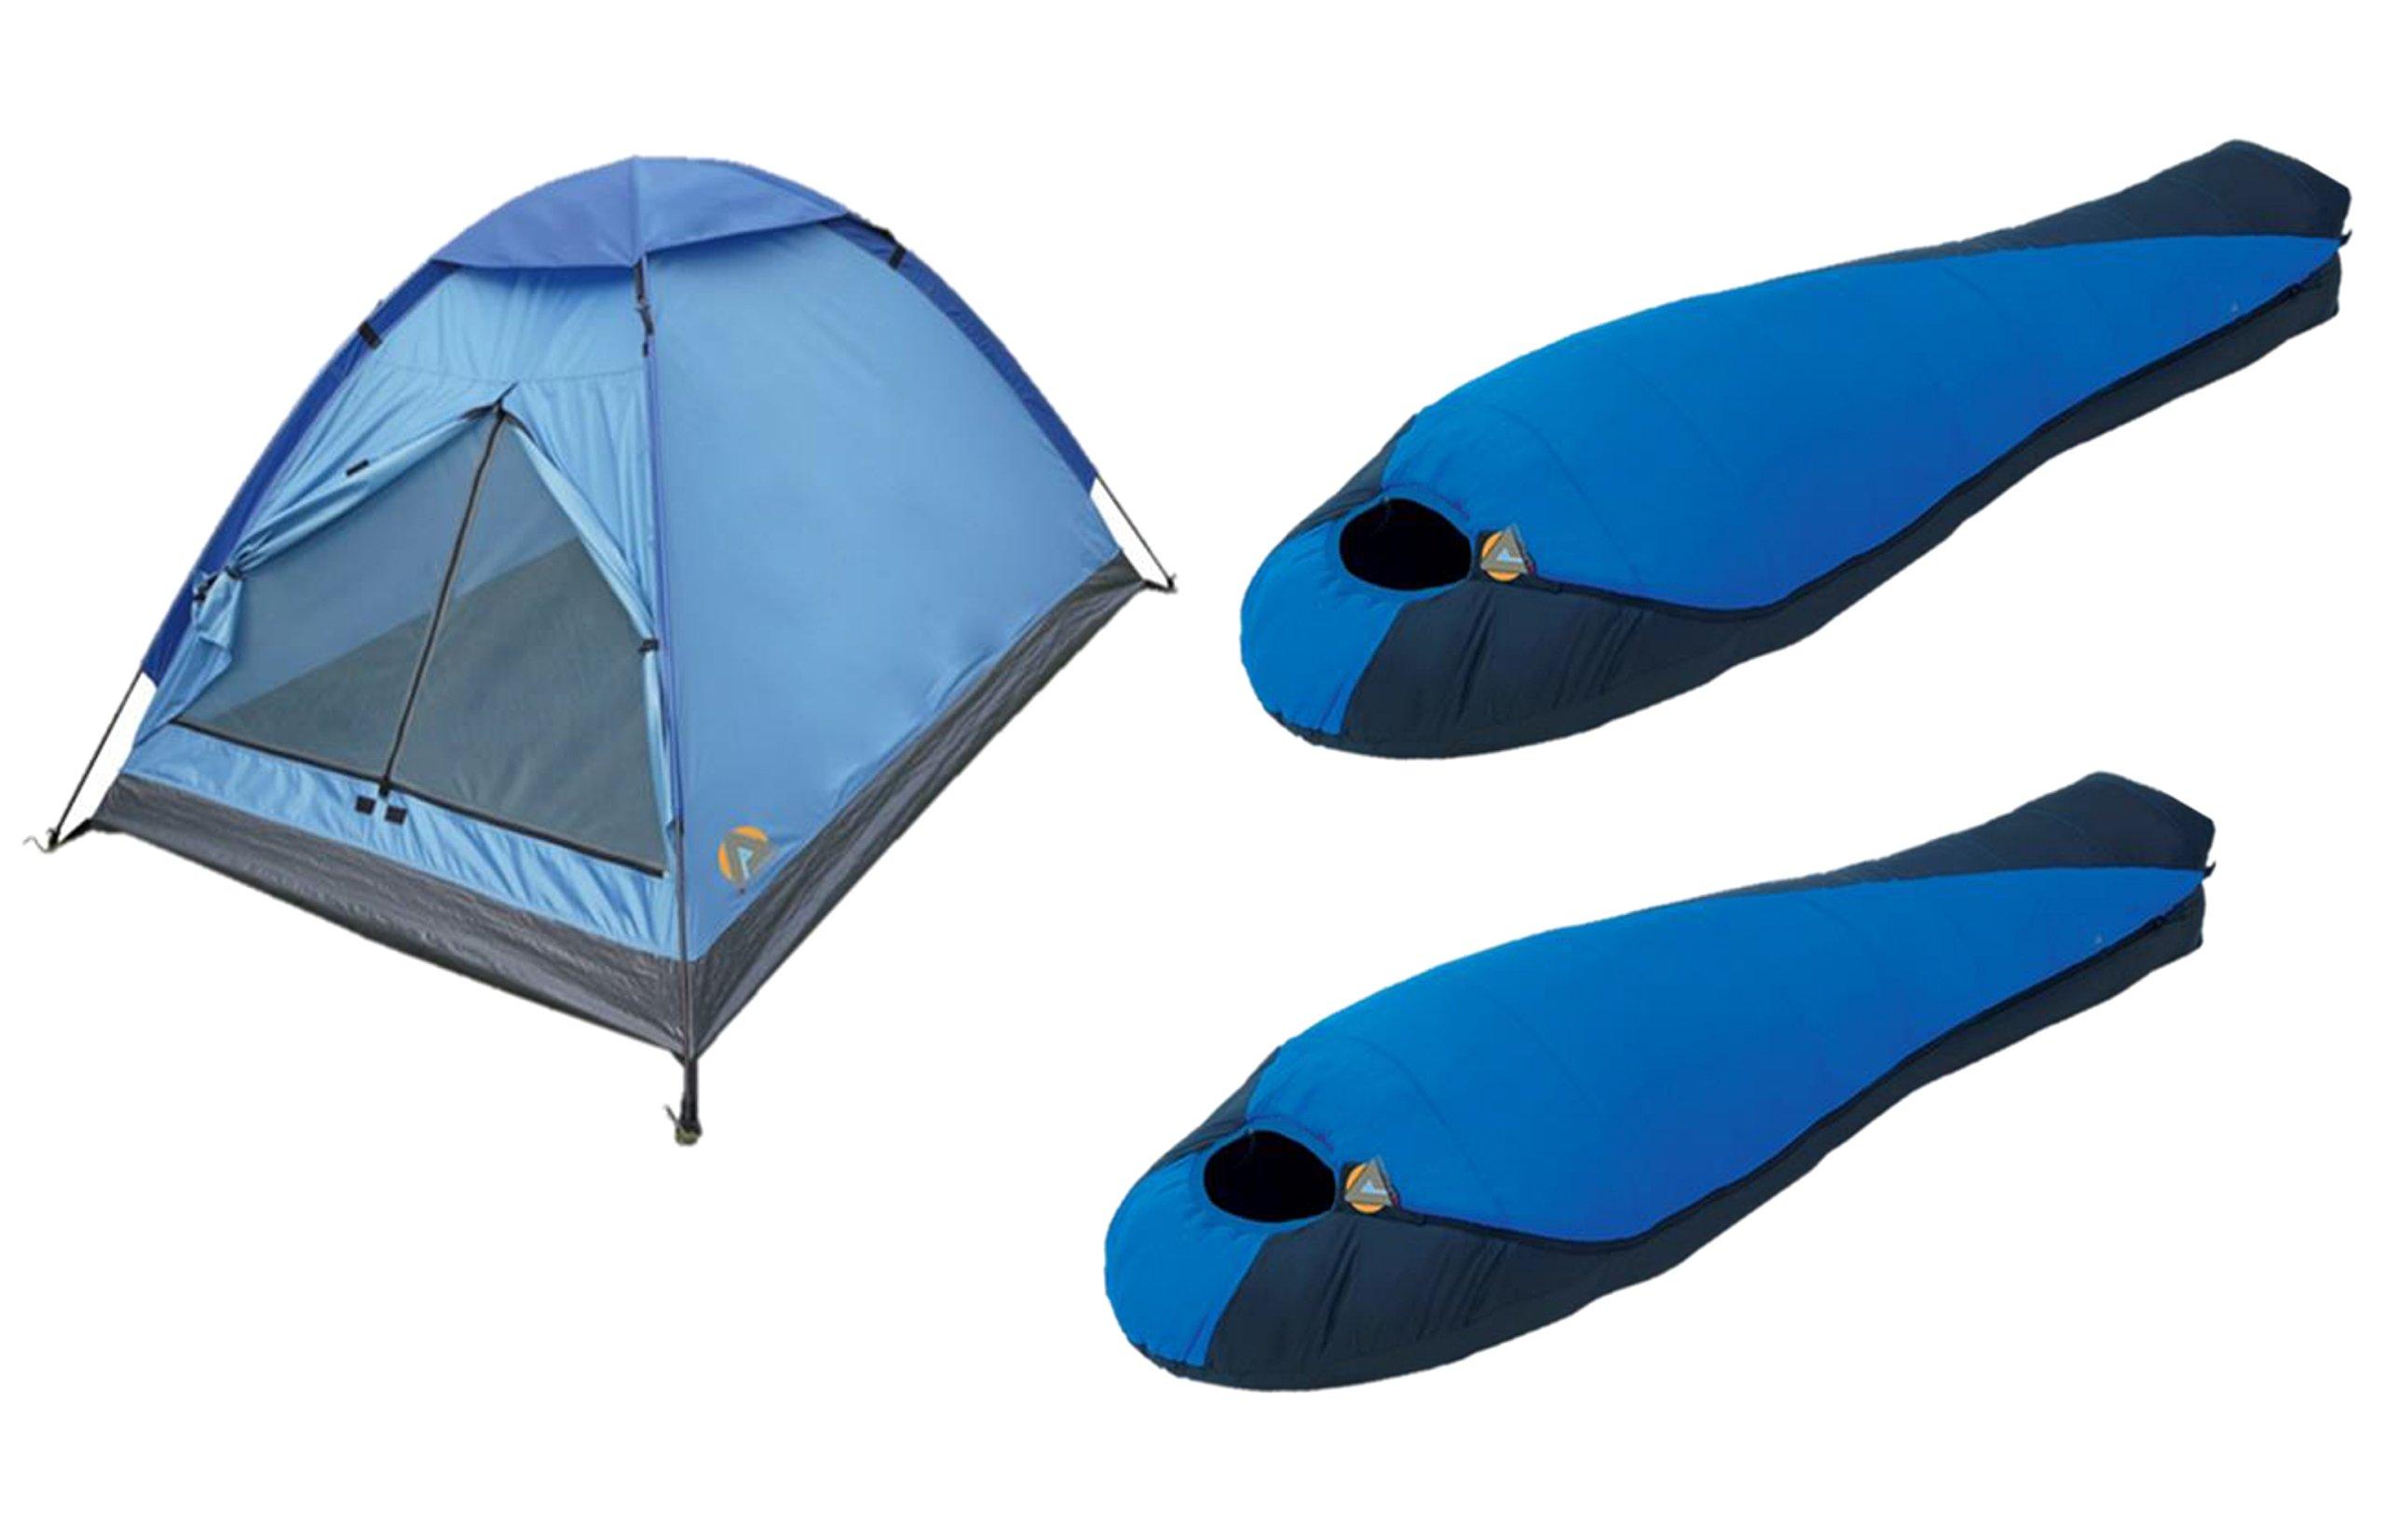 High Peak USA Alpinizmo Two Extreme Pak 0F Sleeping Bags Monodome 3 Tent Combo Set, Blue, One Size by Alpinizmo